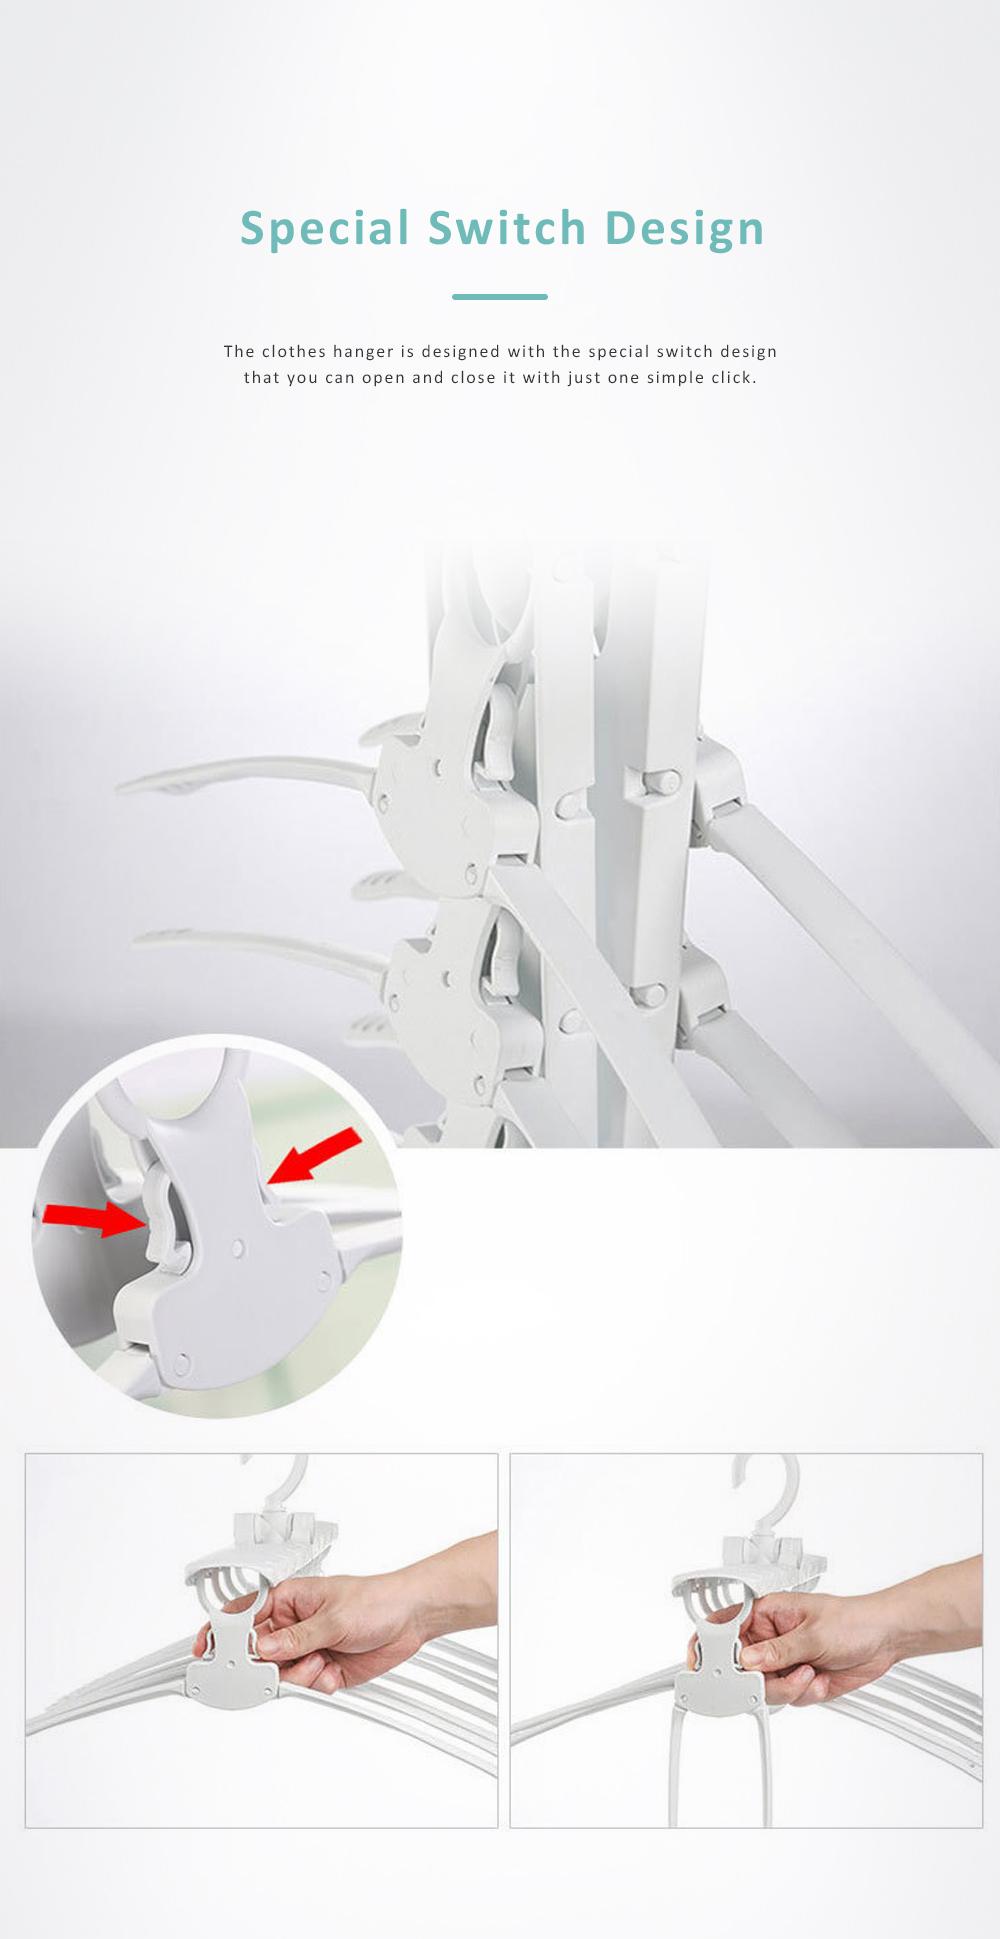 3 Pack Foldable Plastic Clothes Hanger, Multi-functional Flexible Clothes Rack Storage Set Anti-slip Wind-proof 4